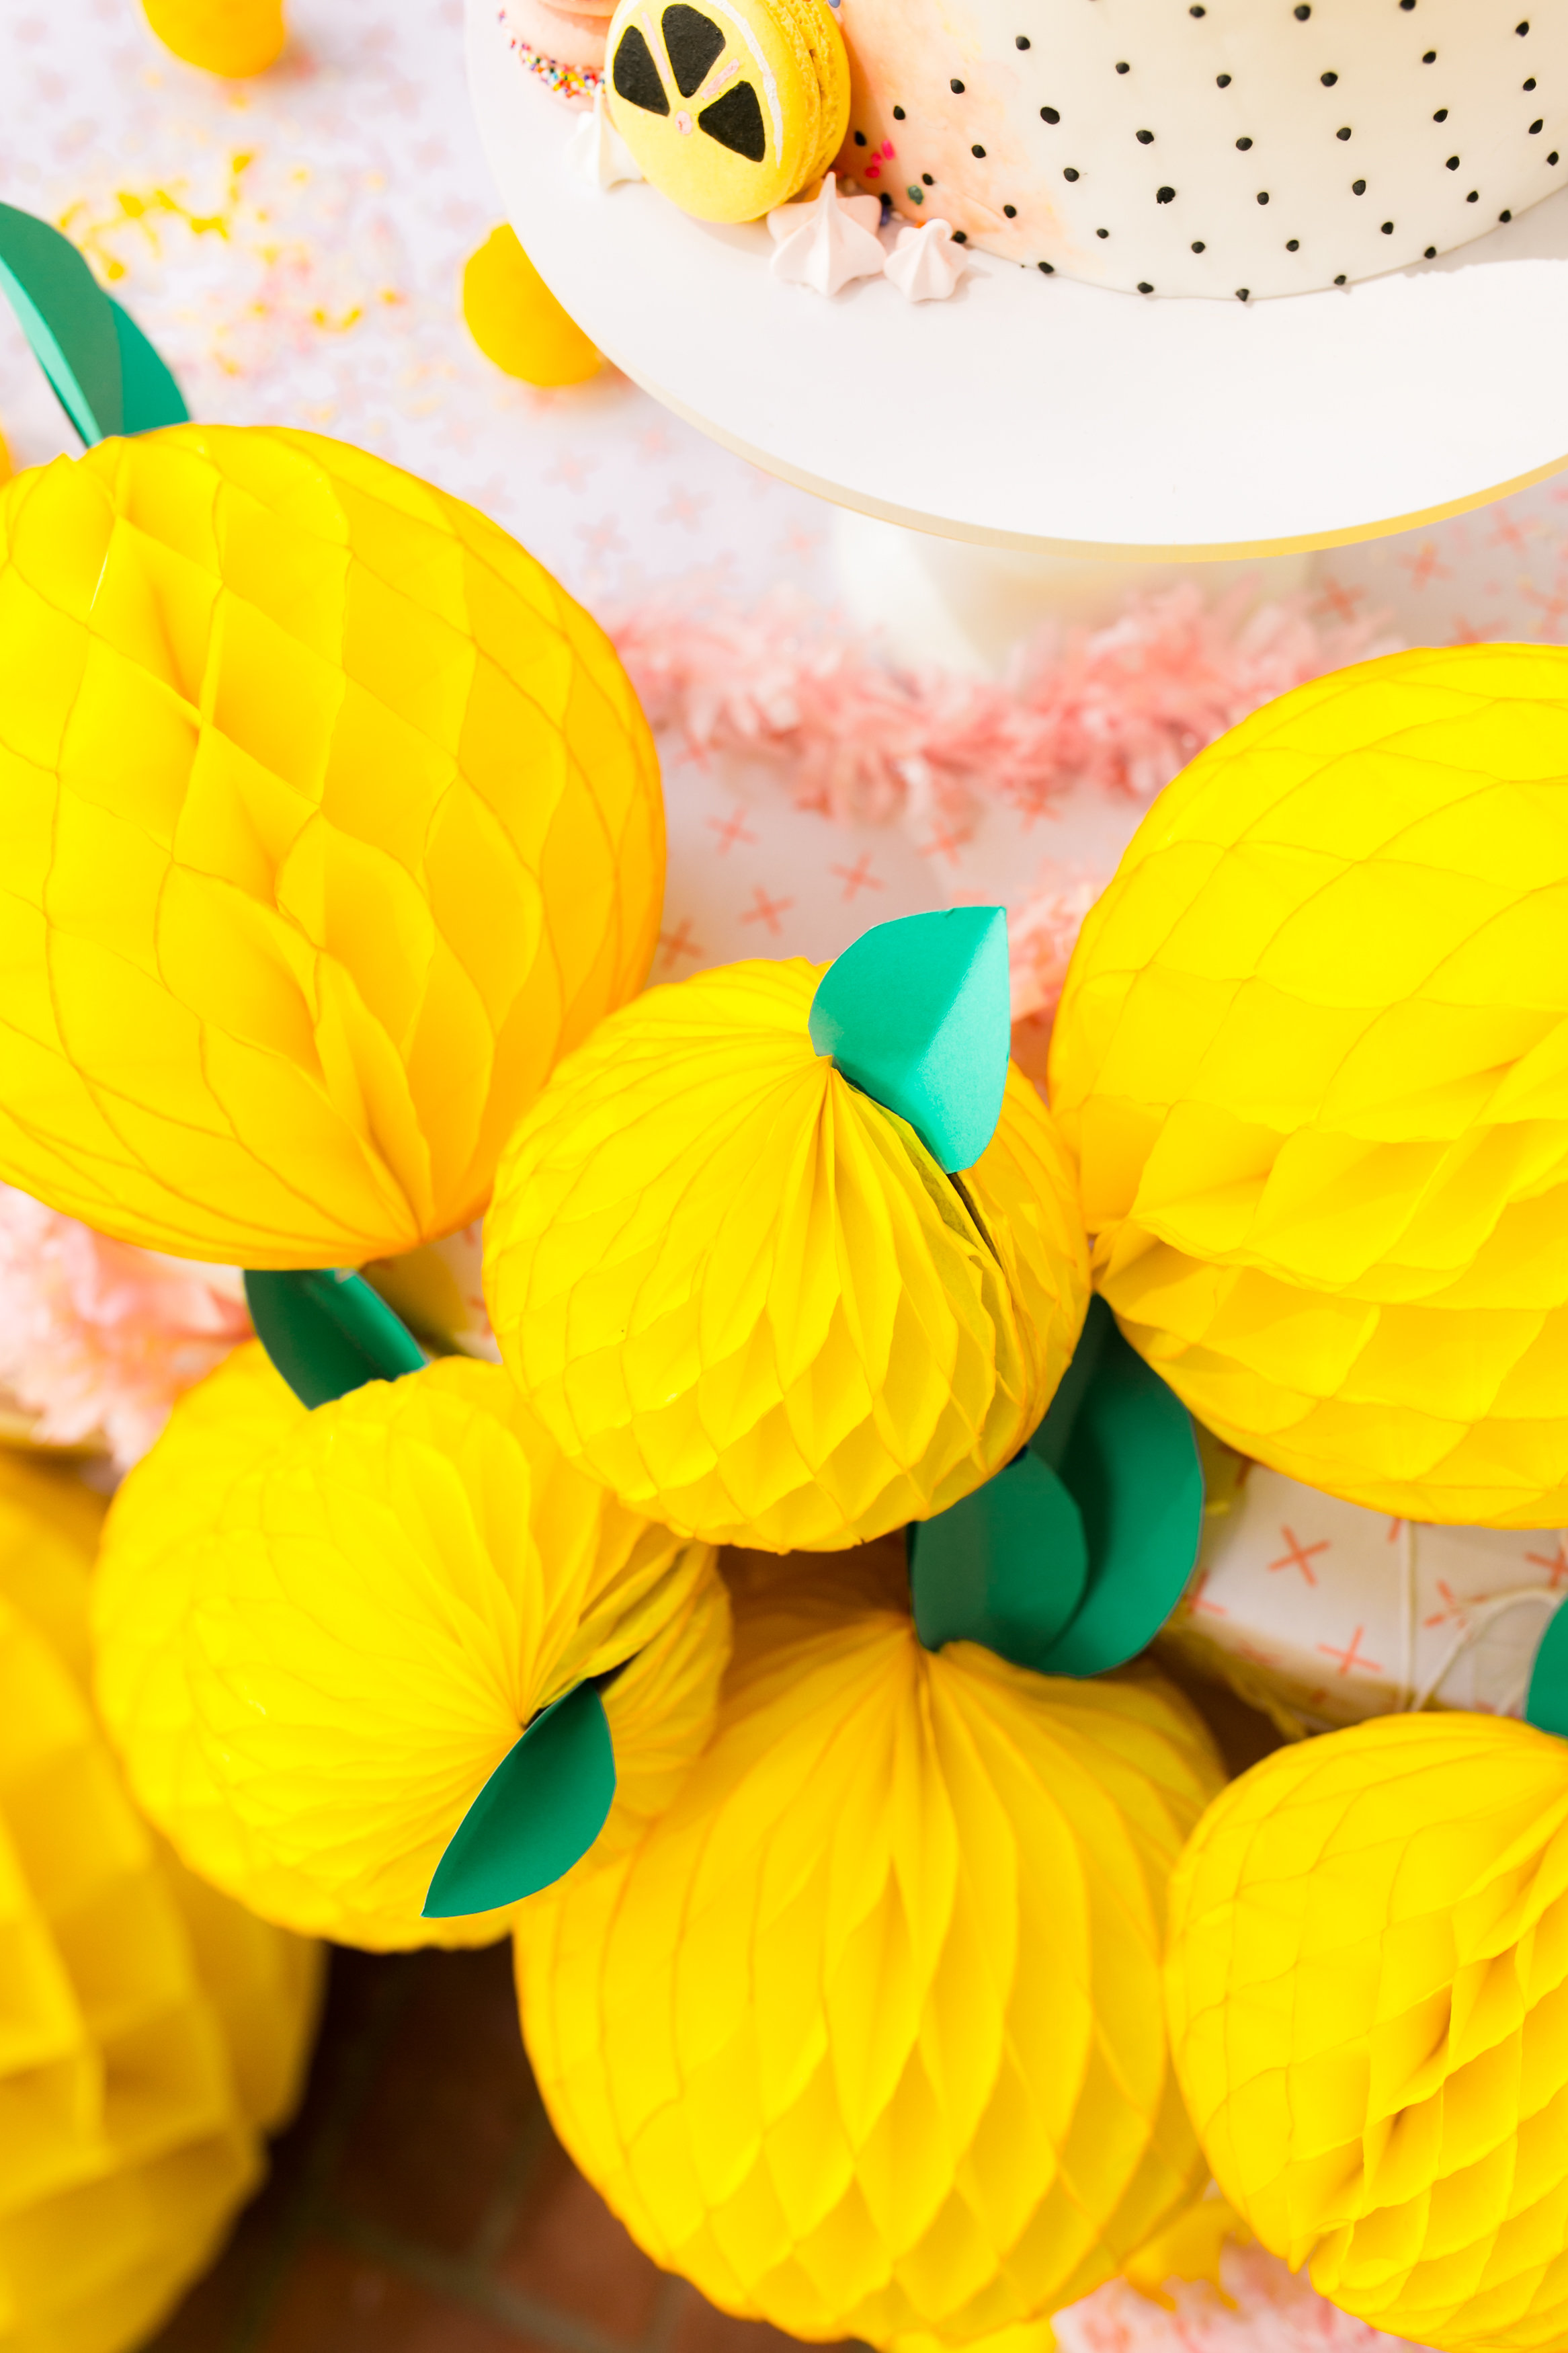 Lemonade Kids Birthday Party - Honeycomb DIY Lemons